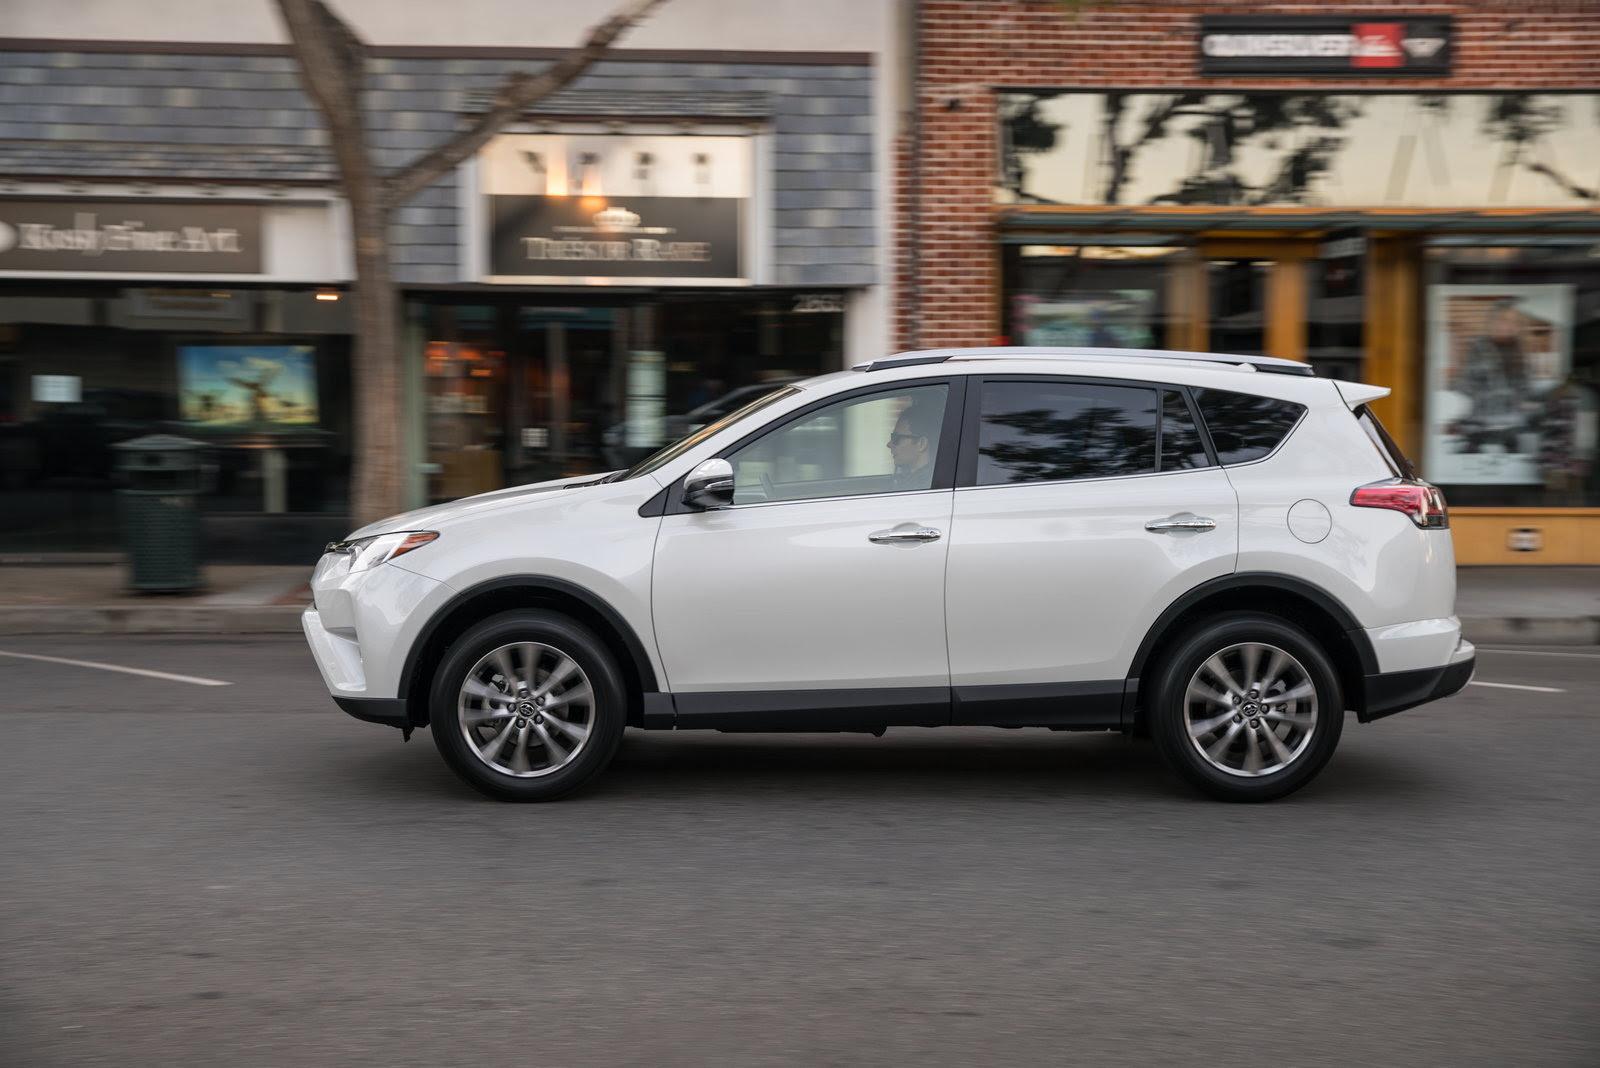 Toyota rav4 lease deals 2018